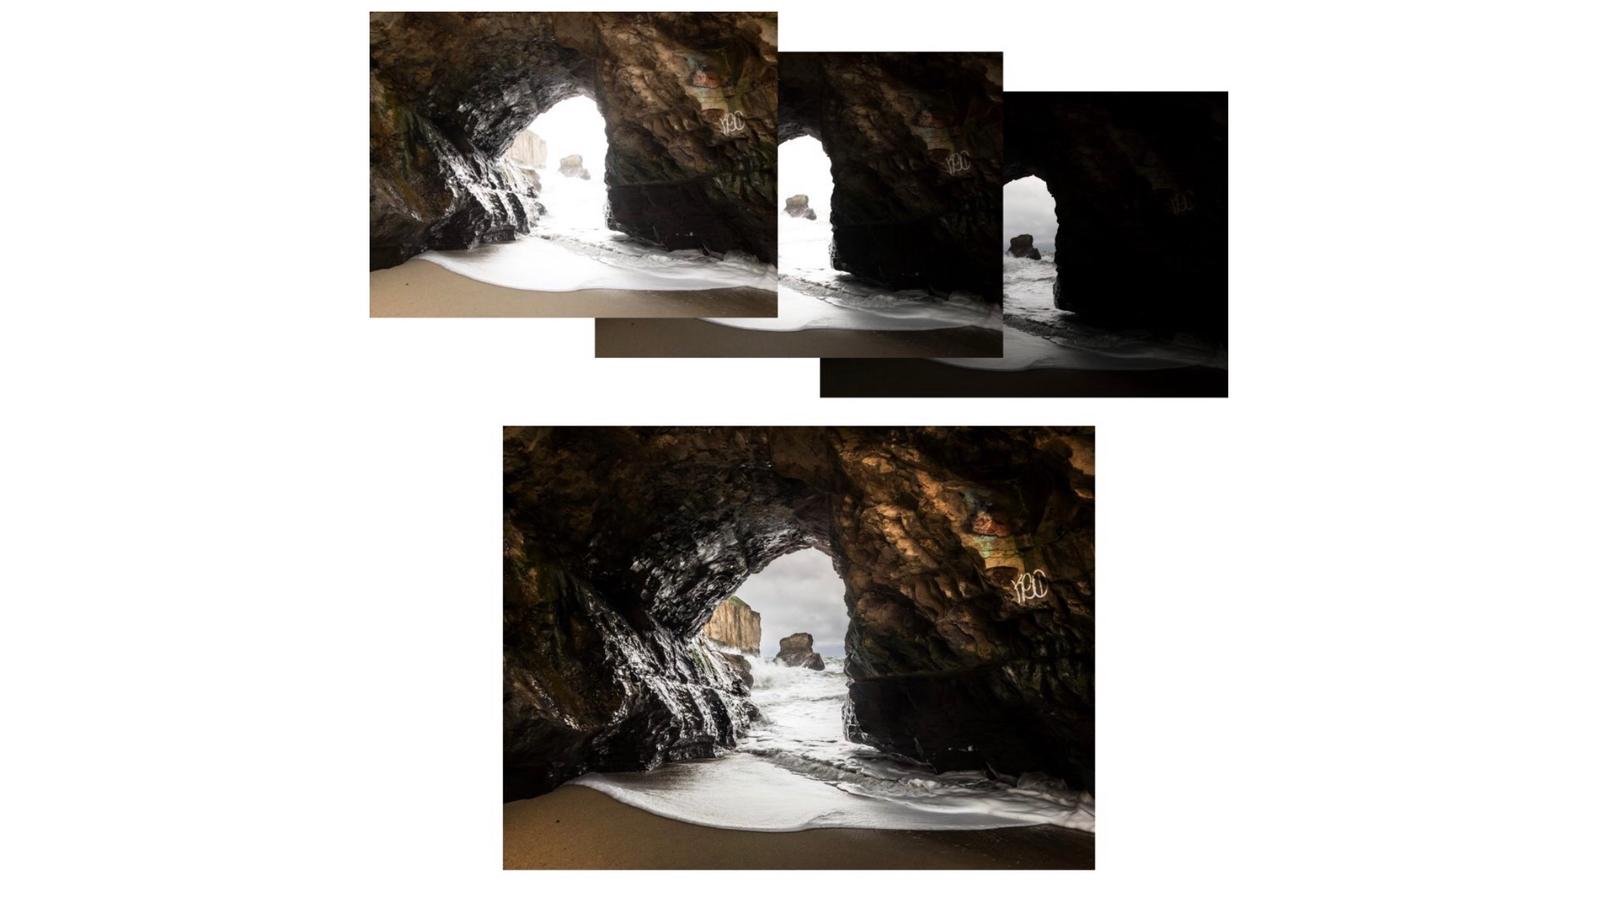 separate exposures in Lightroom hdr mode